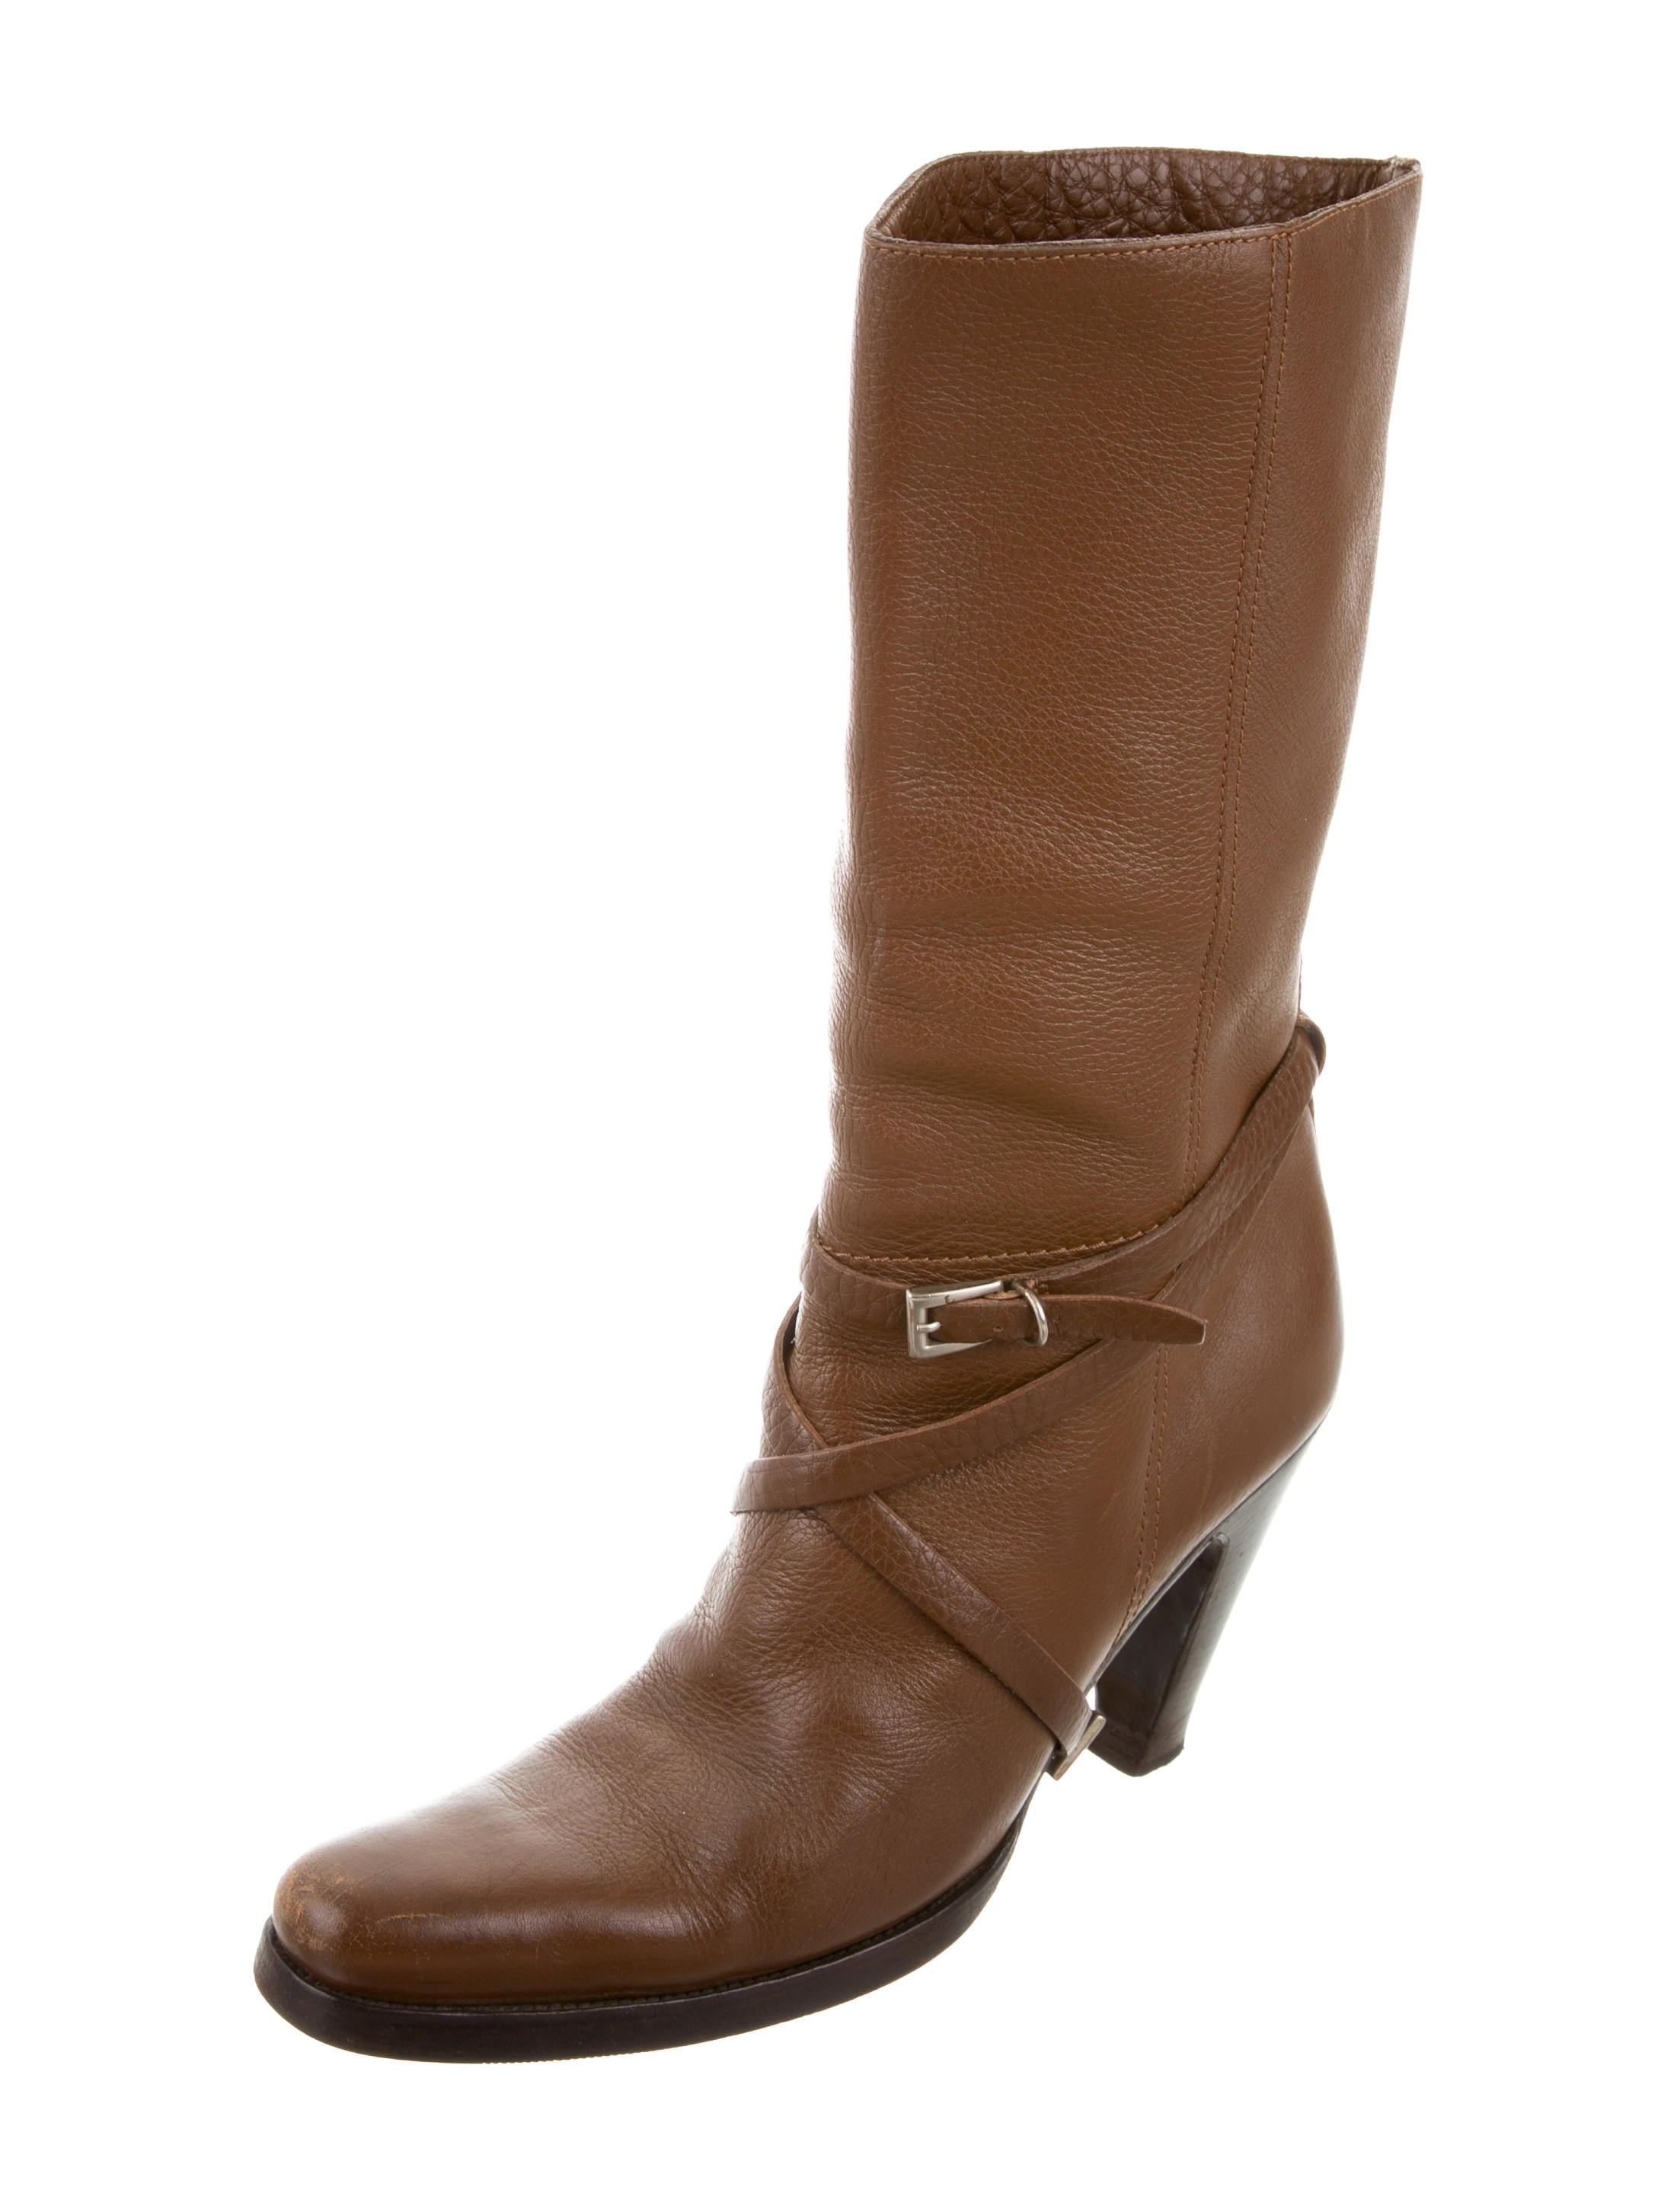 de8f6f64684 Prada Calf Leather Sneakers